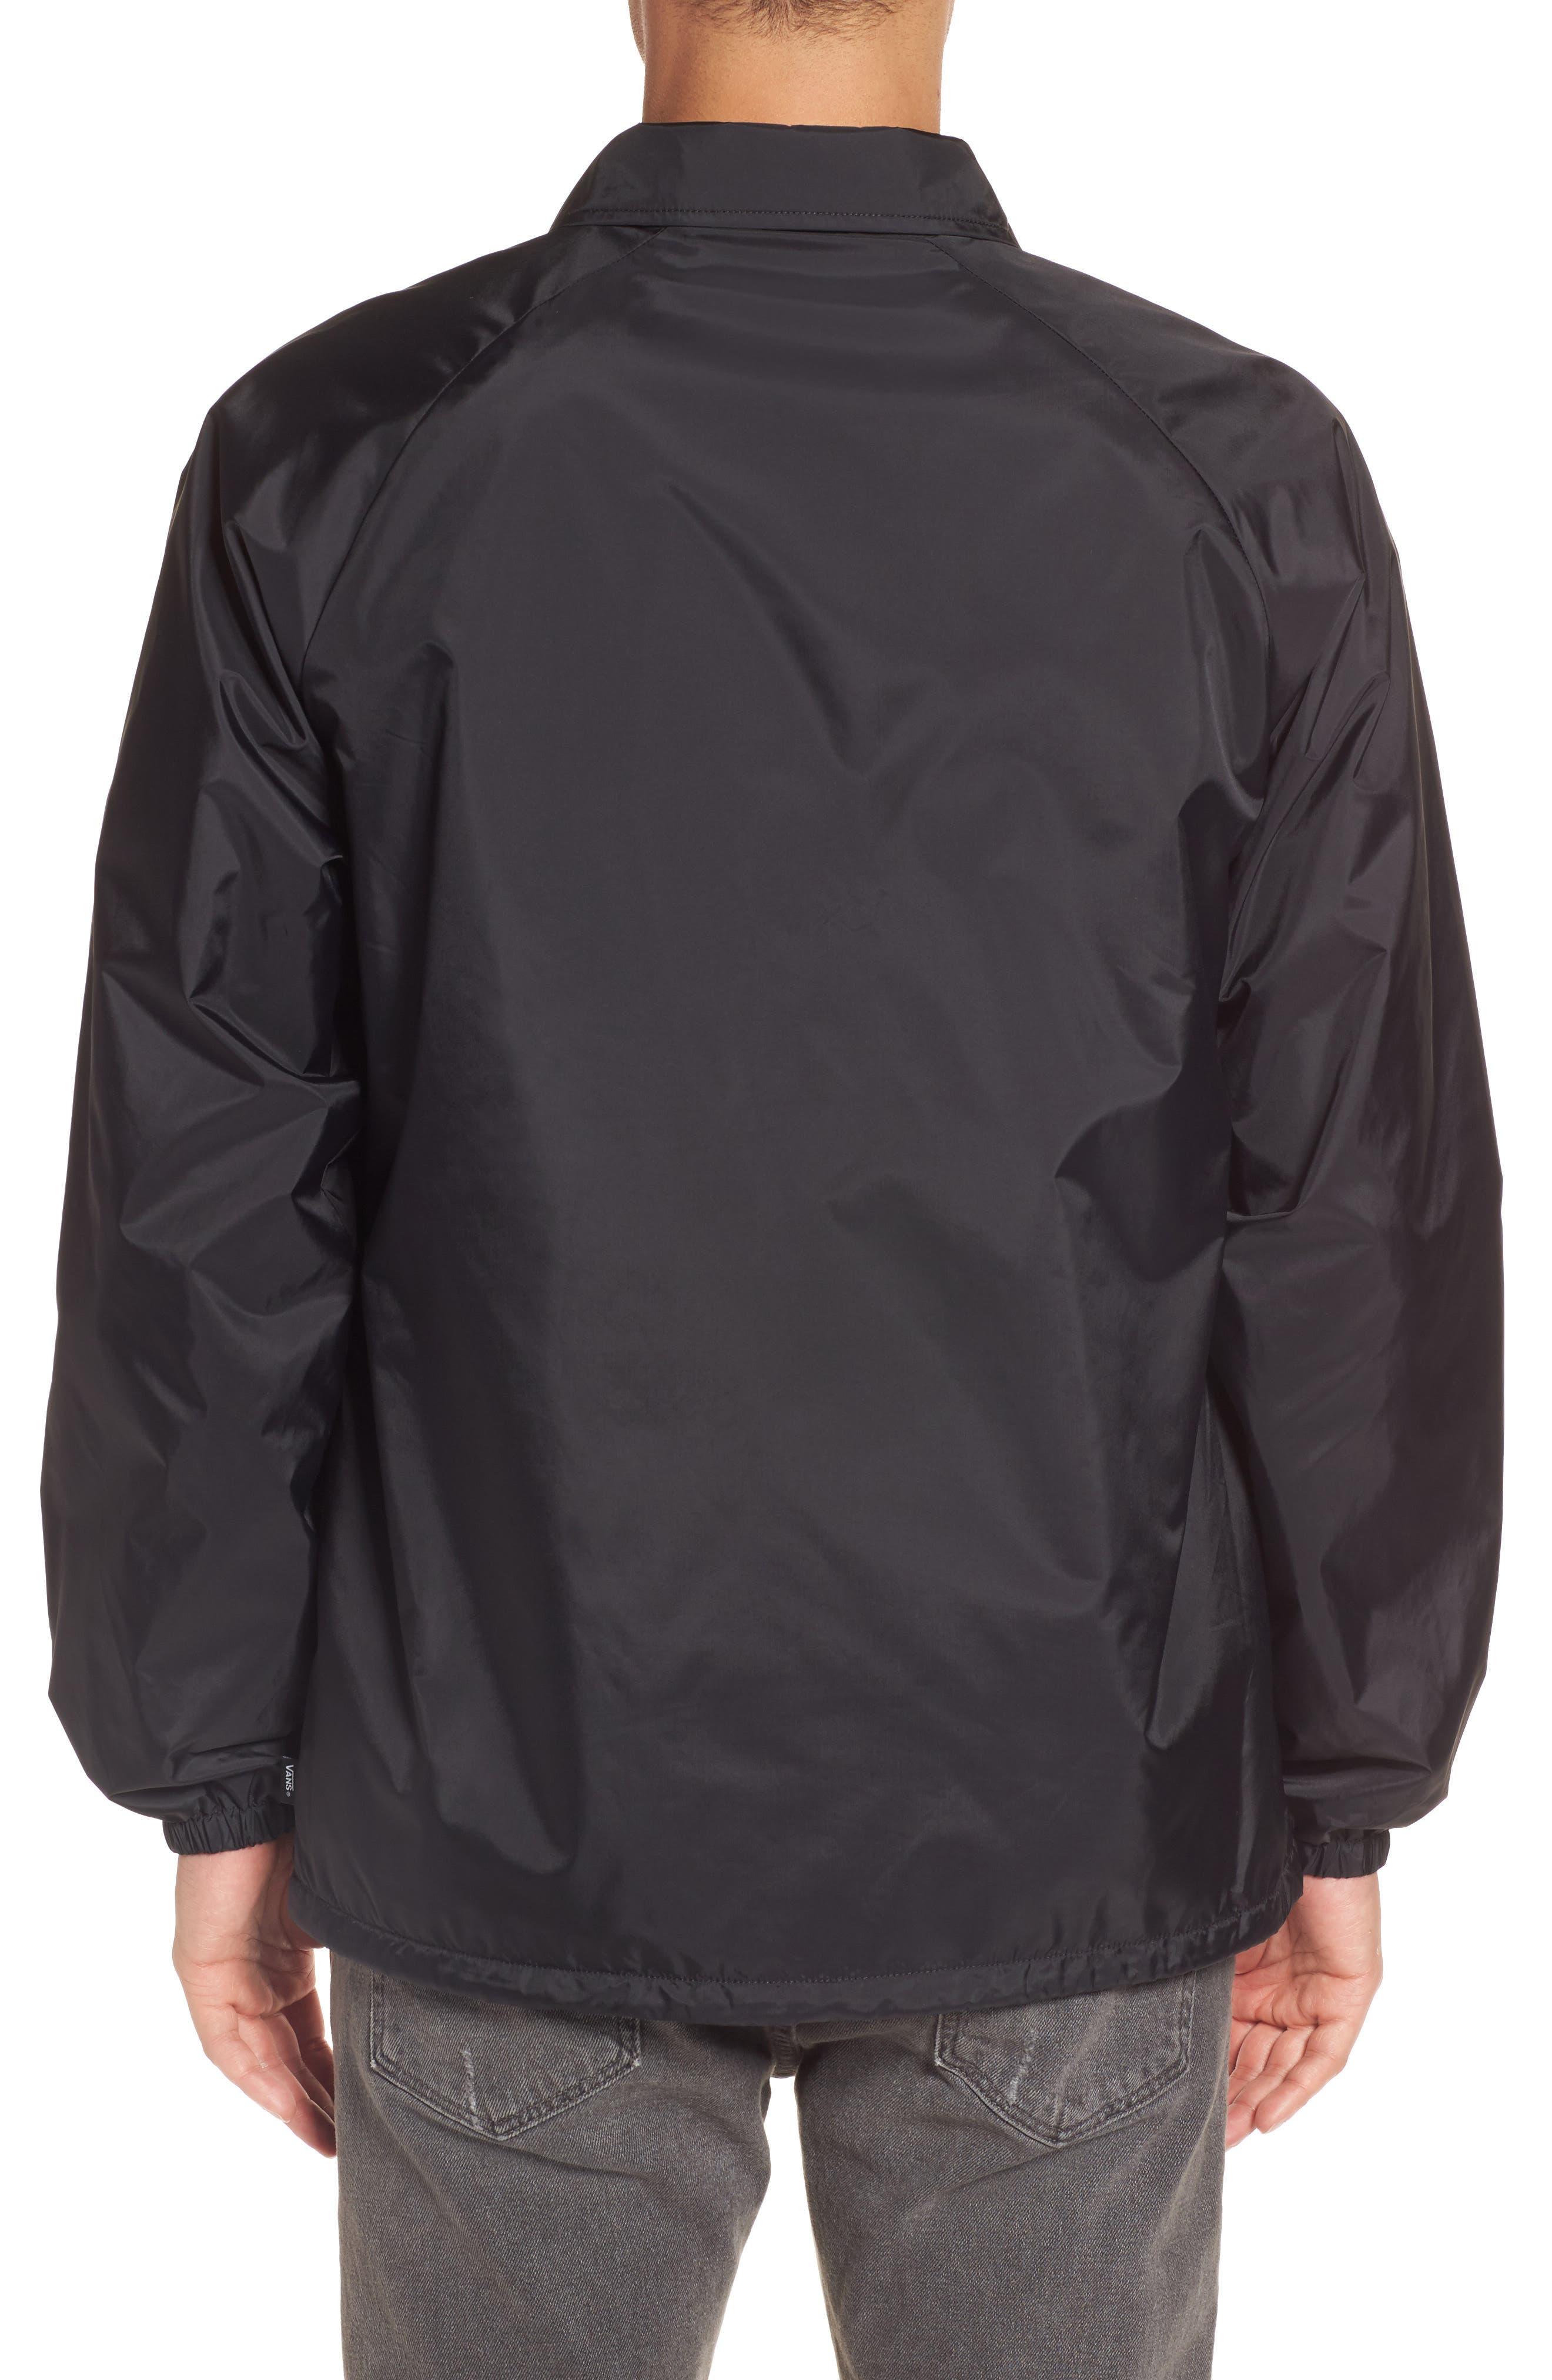 Torrey Water Resistant Jacket,                             Alternate thumbnail 2, color,                             001